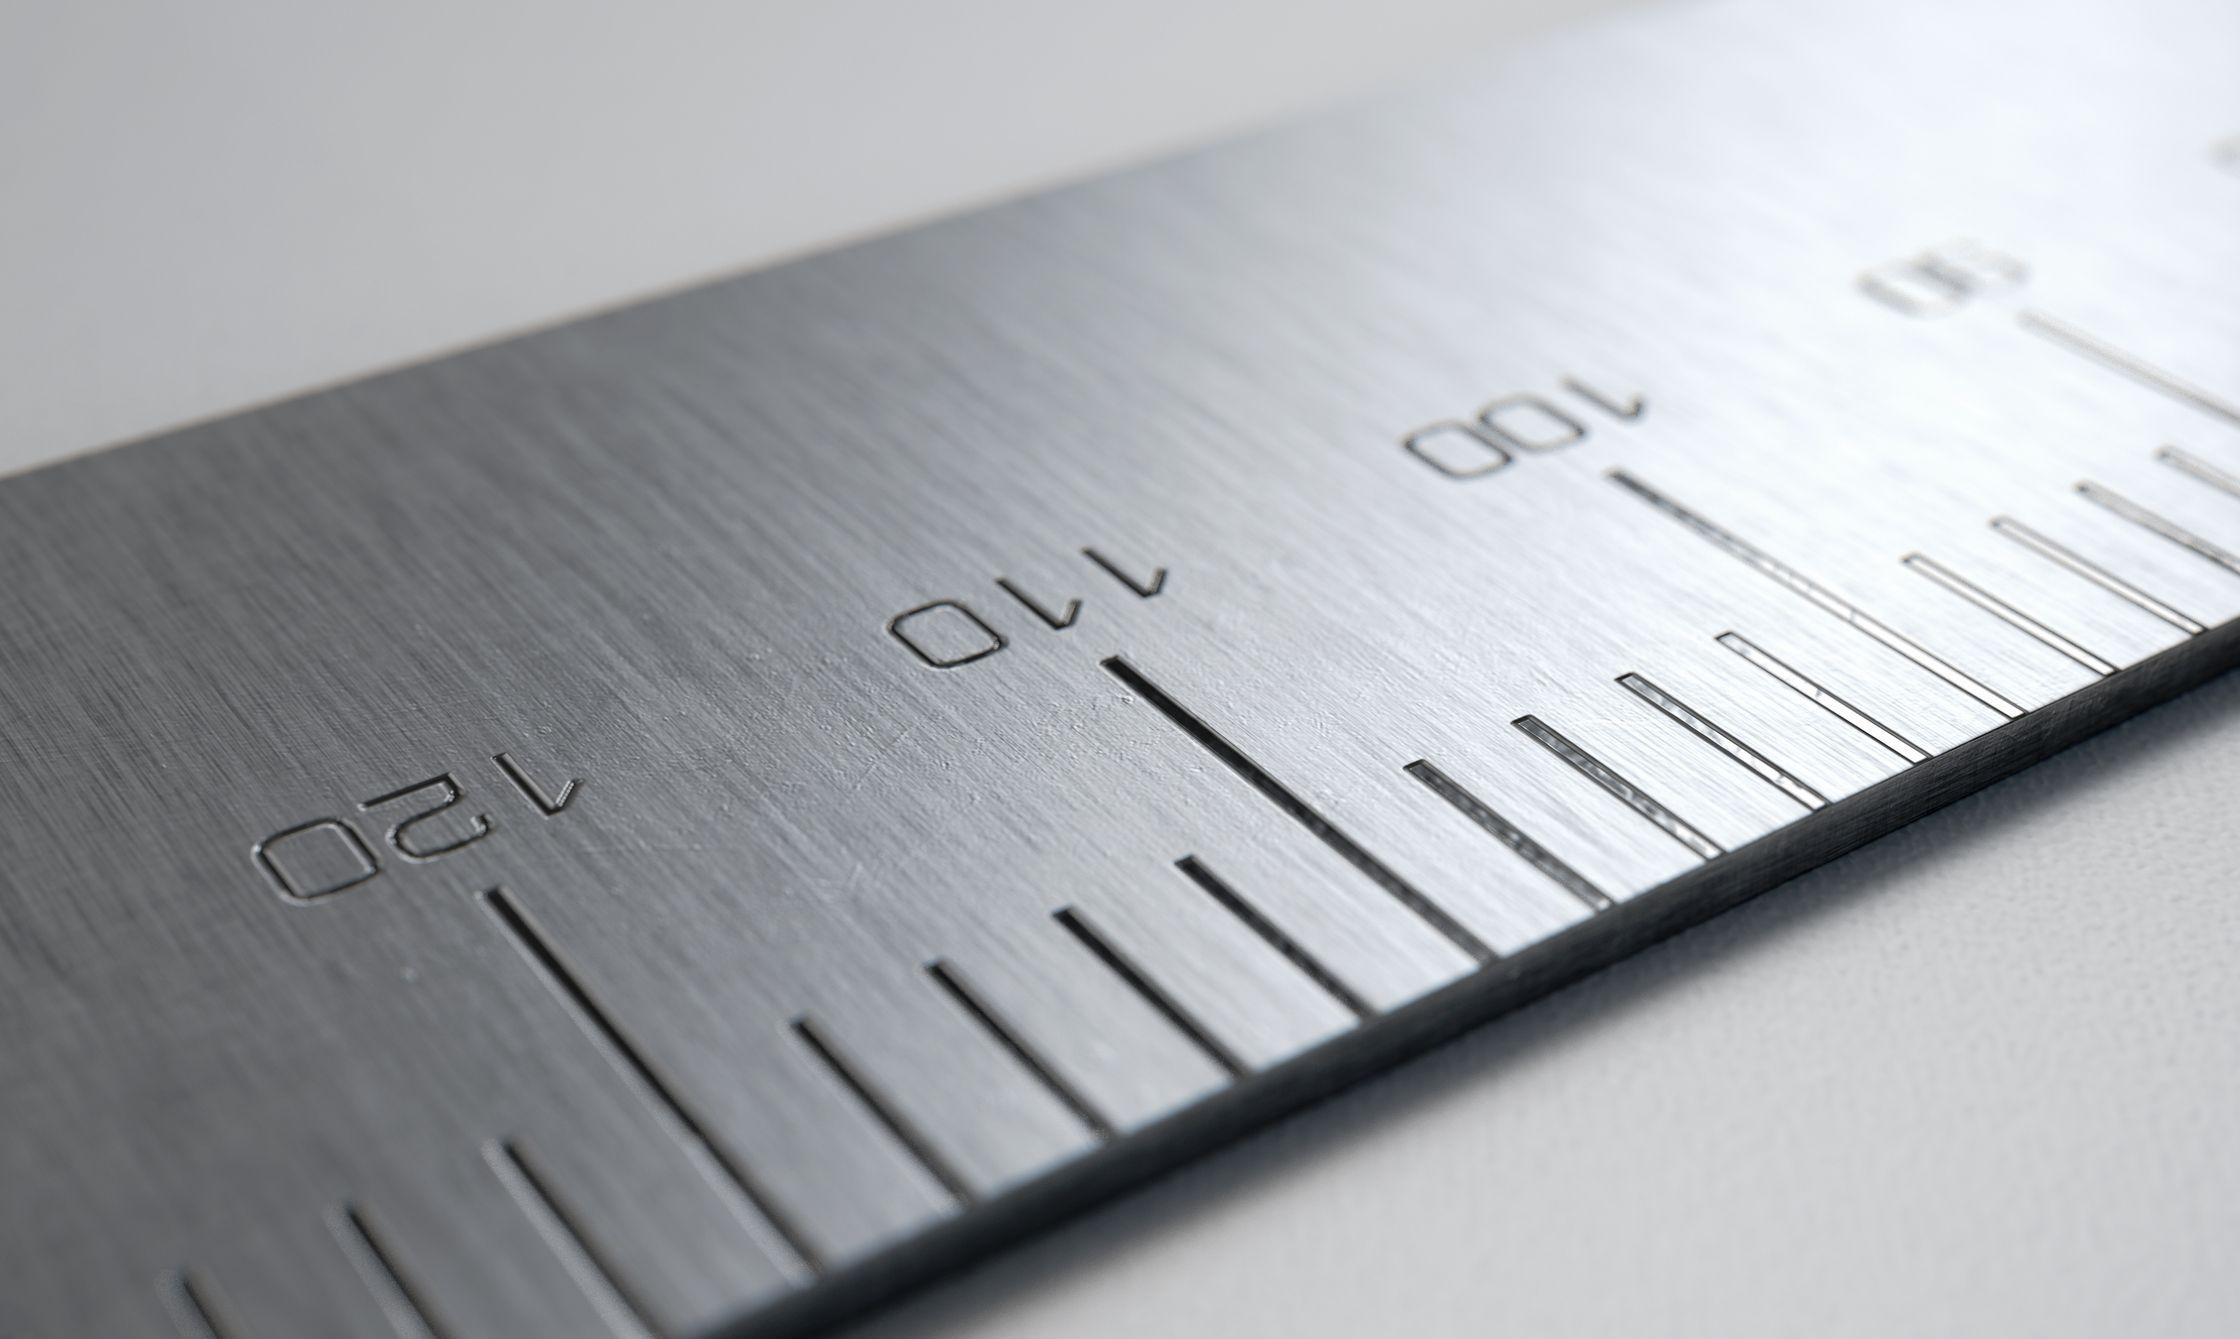 ruler, measuring device